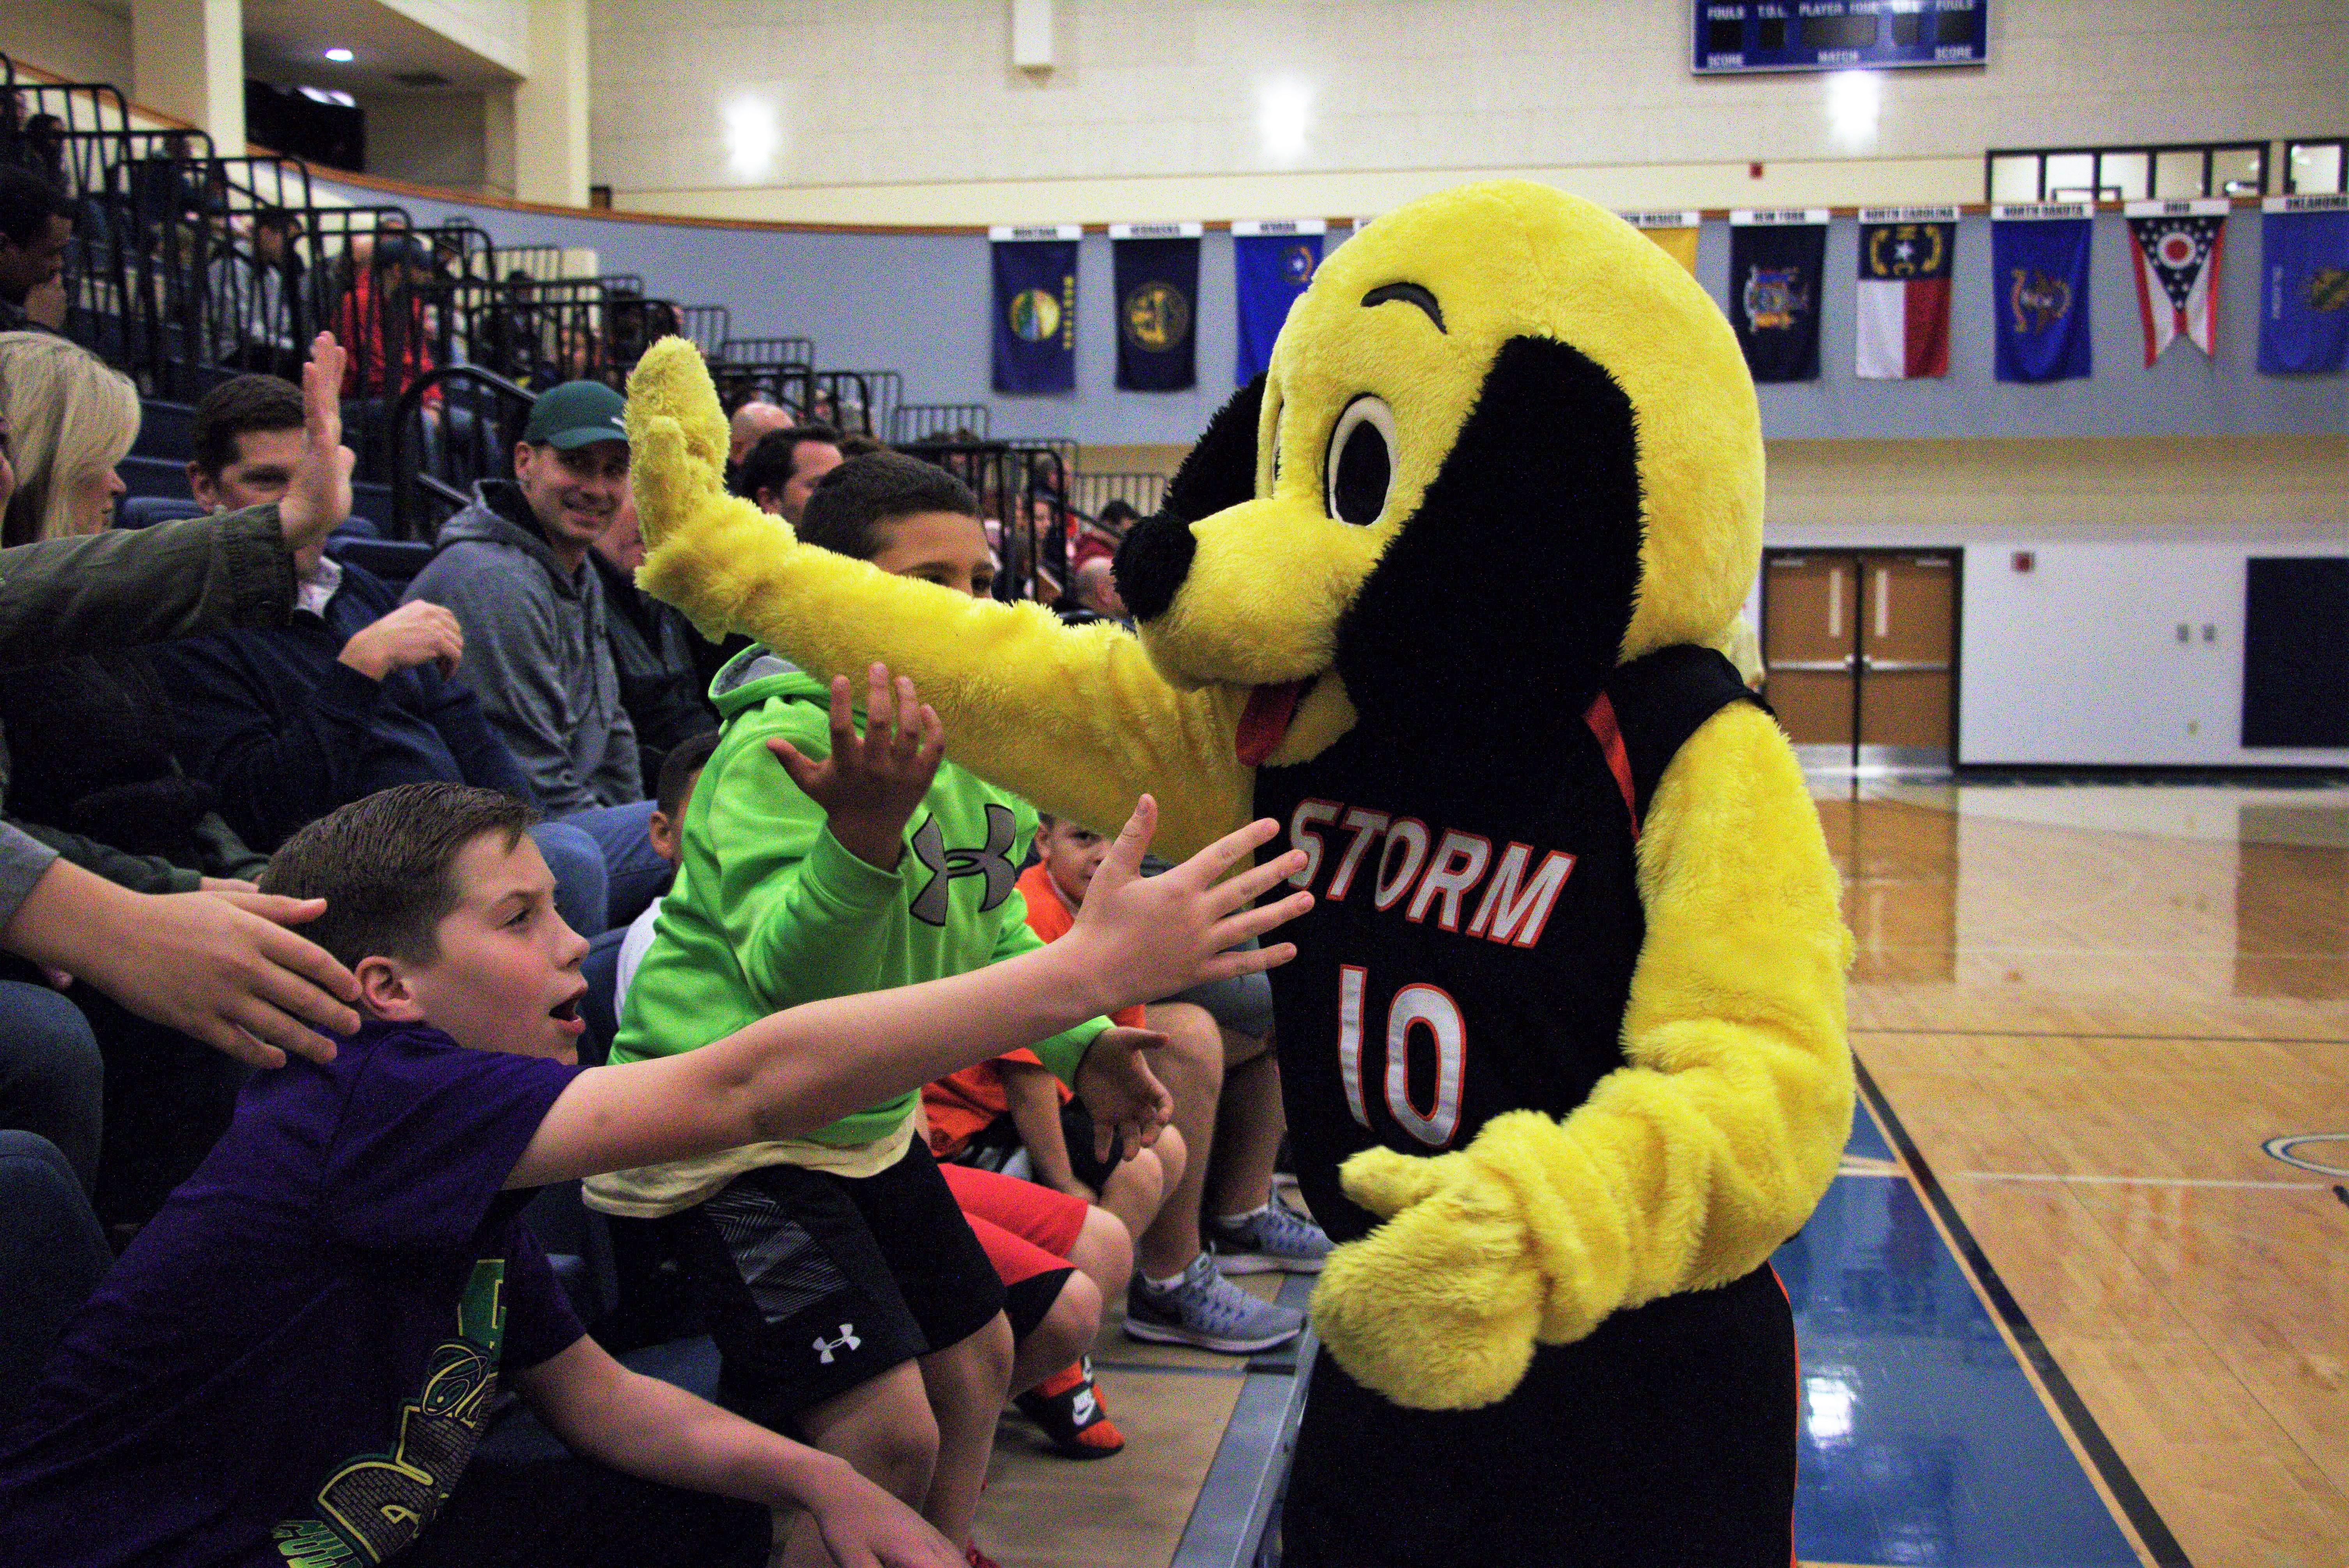 Virginia Storm mascot at a game at Patrick Henry College (PHC)